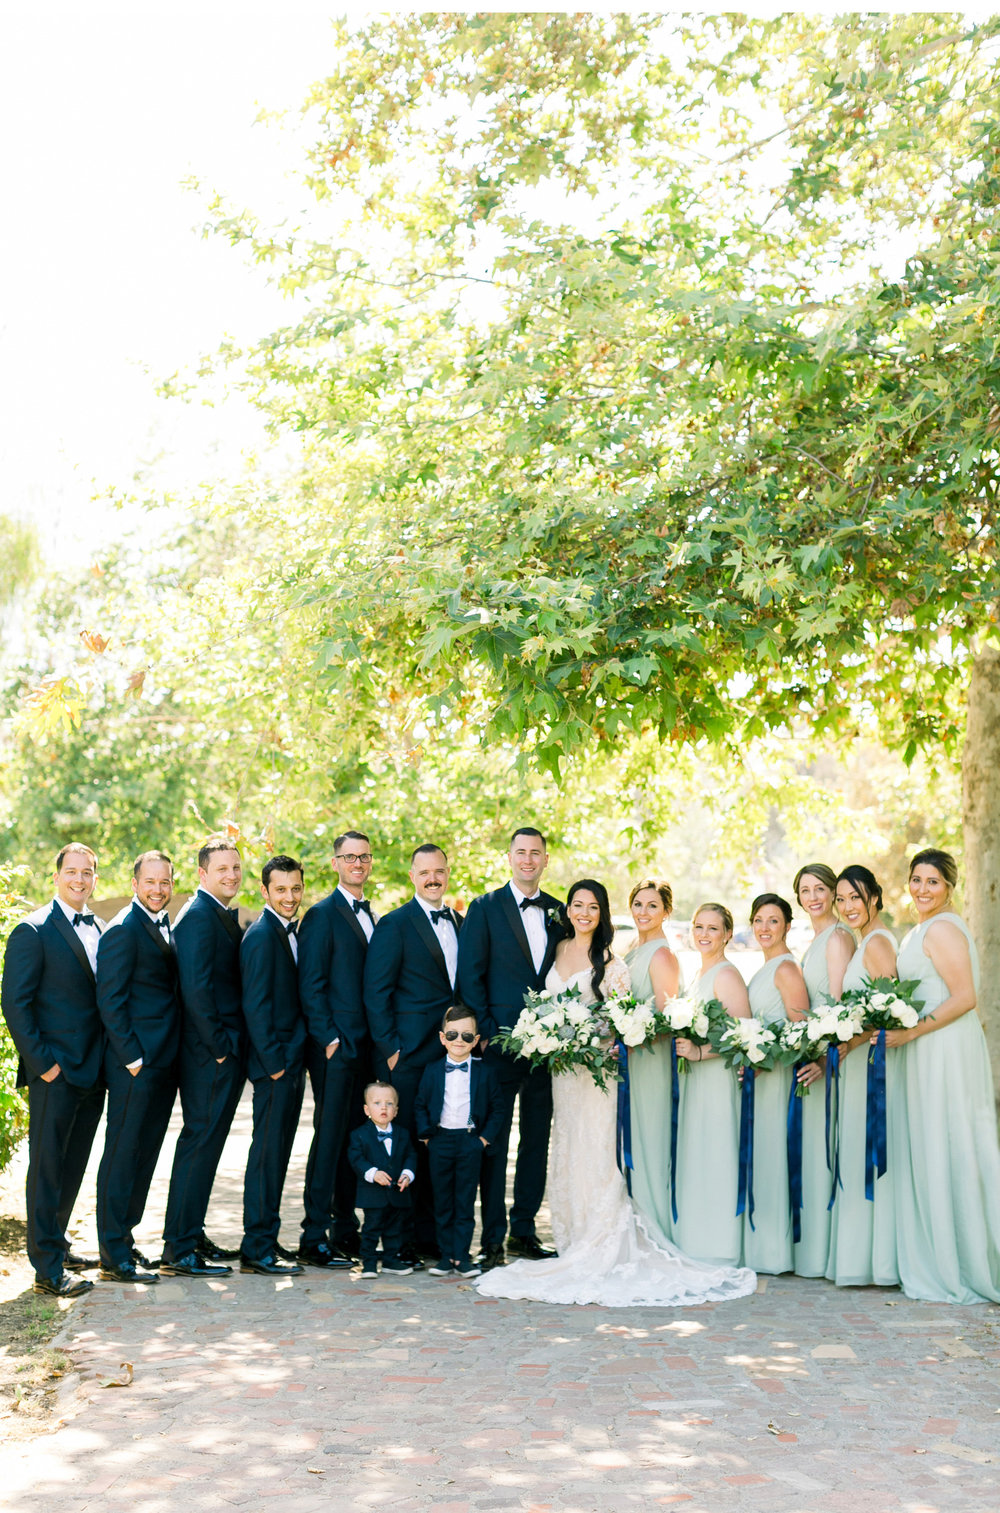 Southern-California-Weddings-Natalie-Schutt-Photography-Weddings_10.jpg